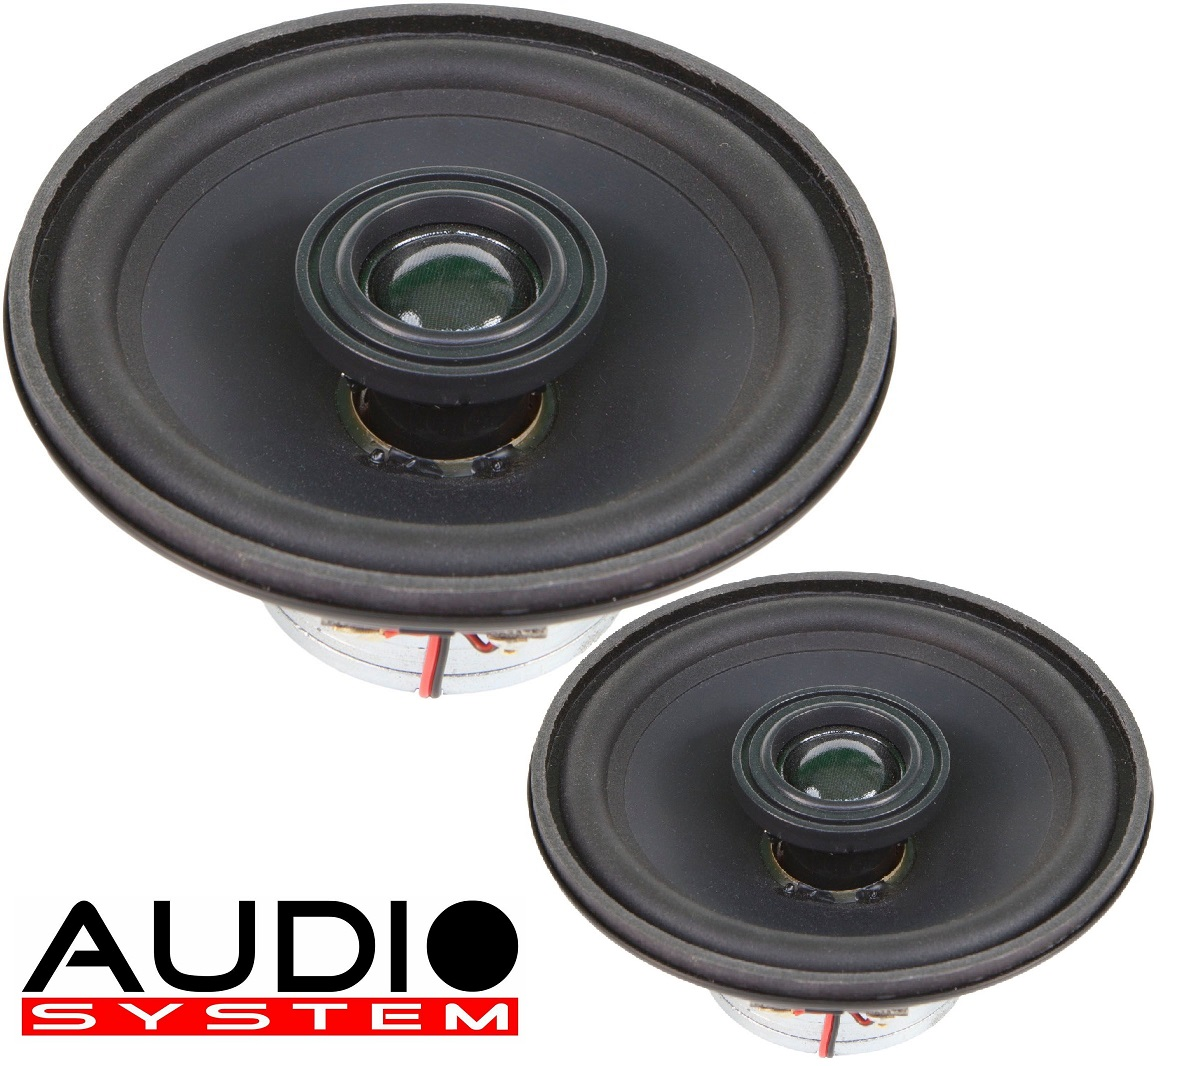 Audio System XC 120 EVO X-SERIES Neodym Coaxial System 12cm, 125 Watt 1 Paar